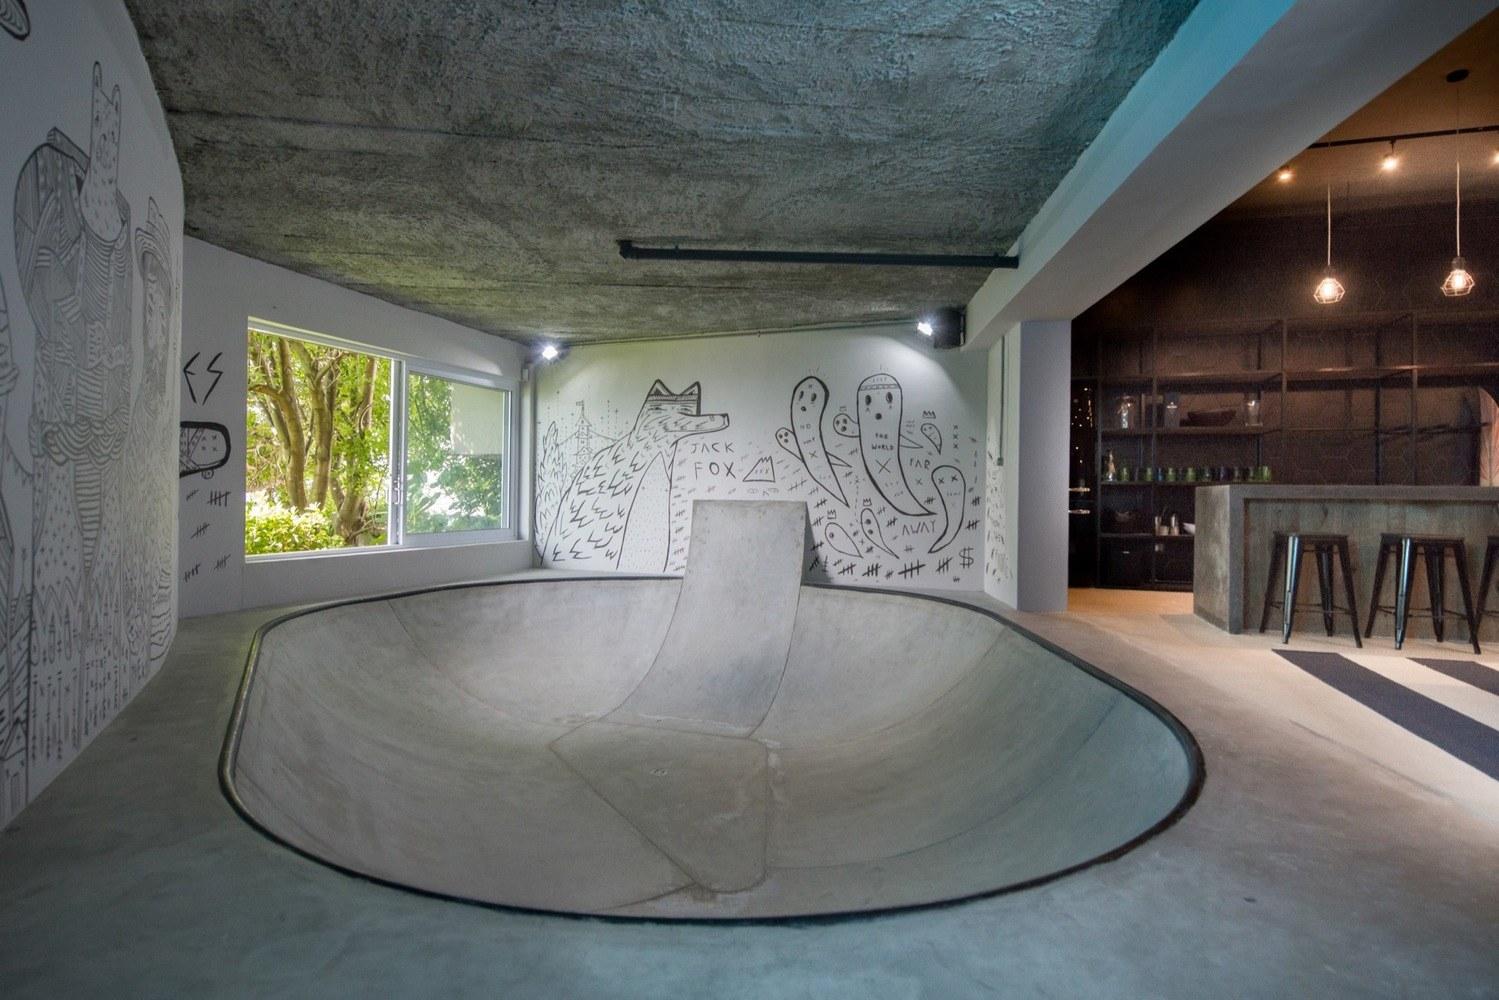 indoor skate park with custom wall art